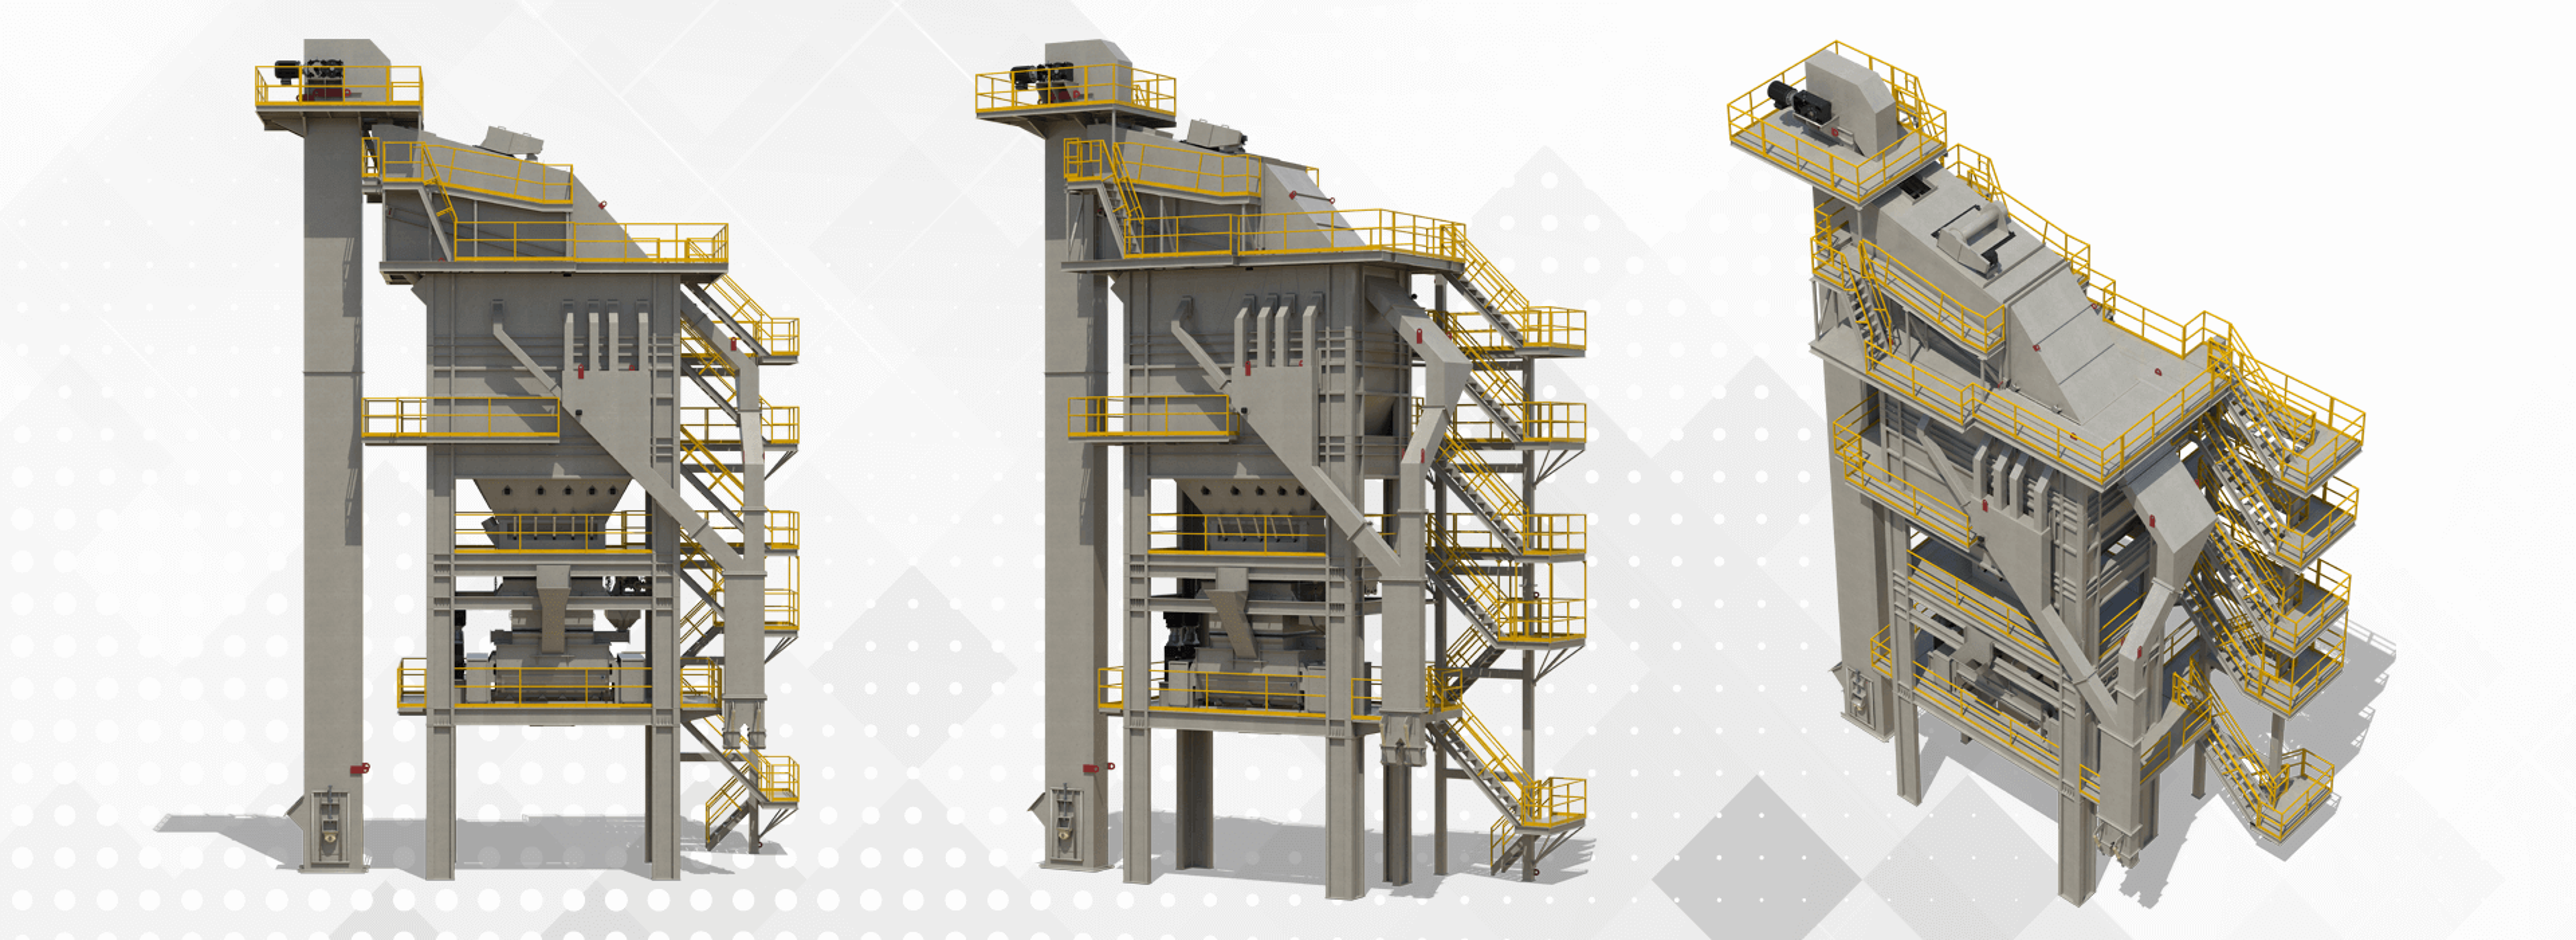 Astec ABT Tower 3D Illustration